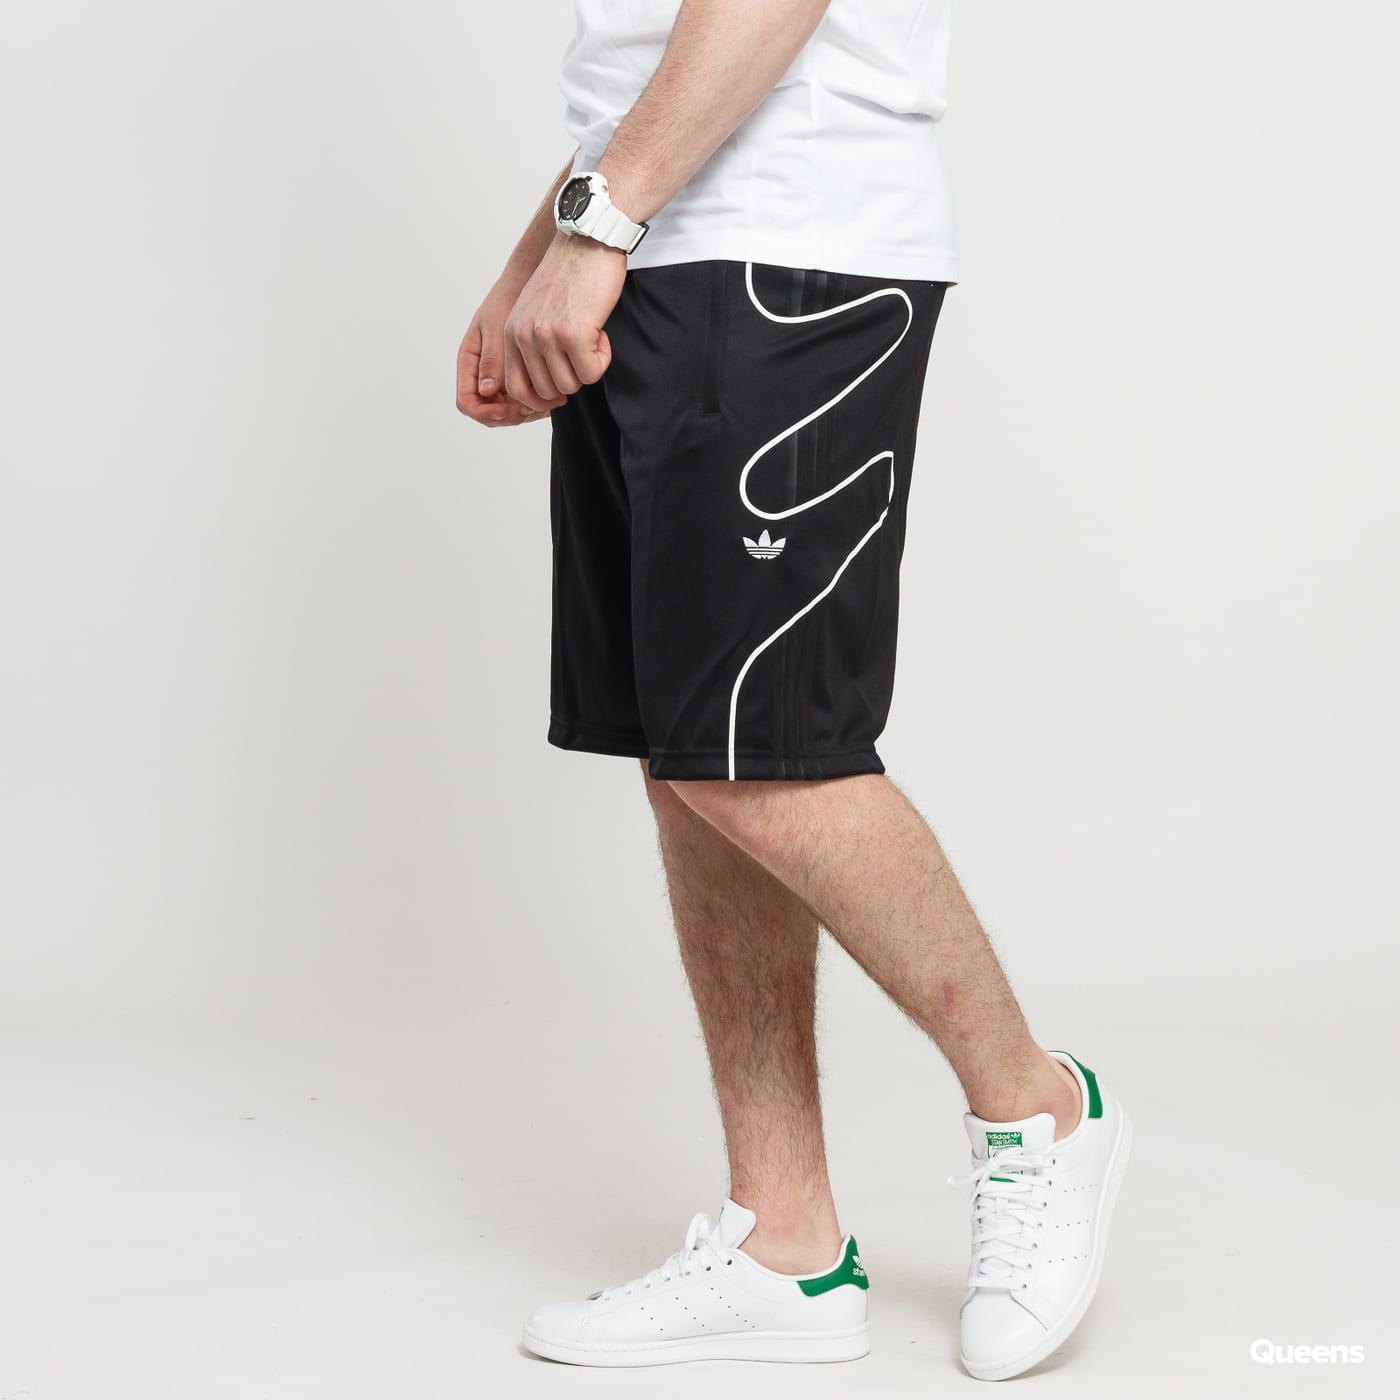 adidas FLAMESTRIKE DK Short Black Satin M schwarz DX2126